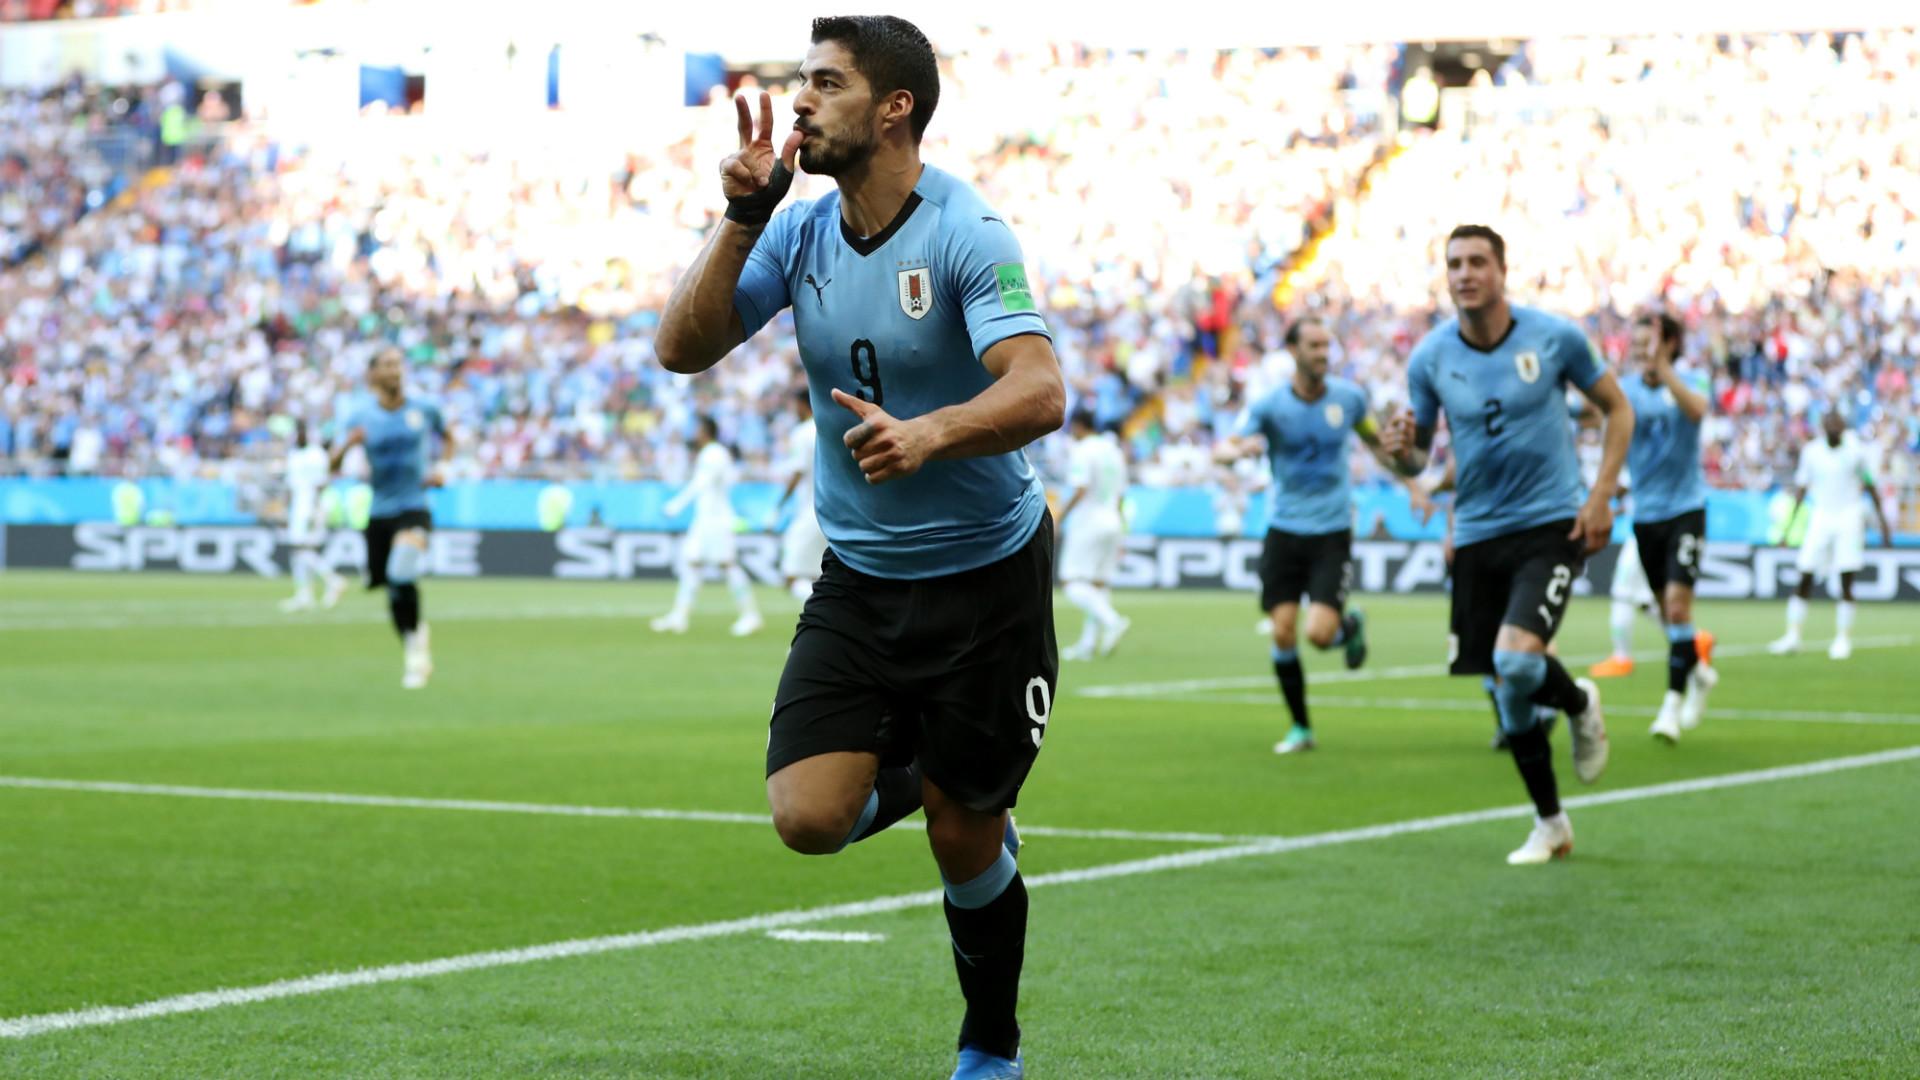 uruguay 1  06  18